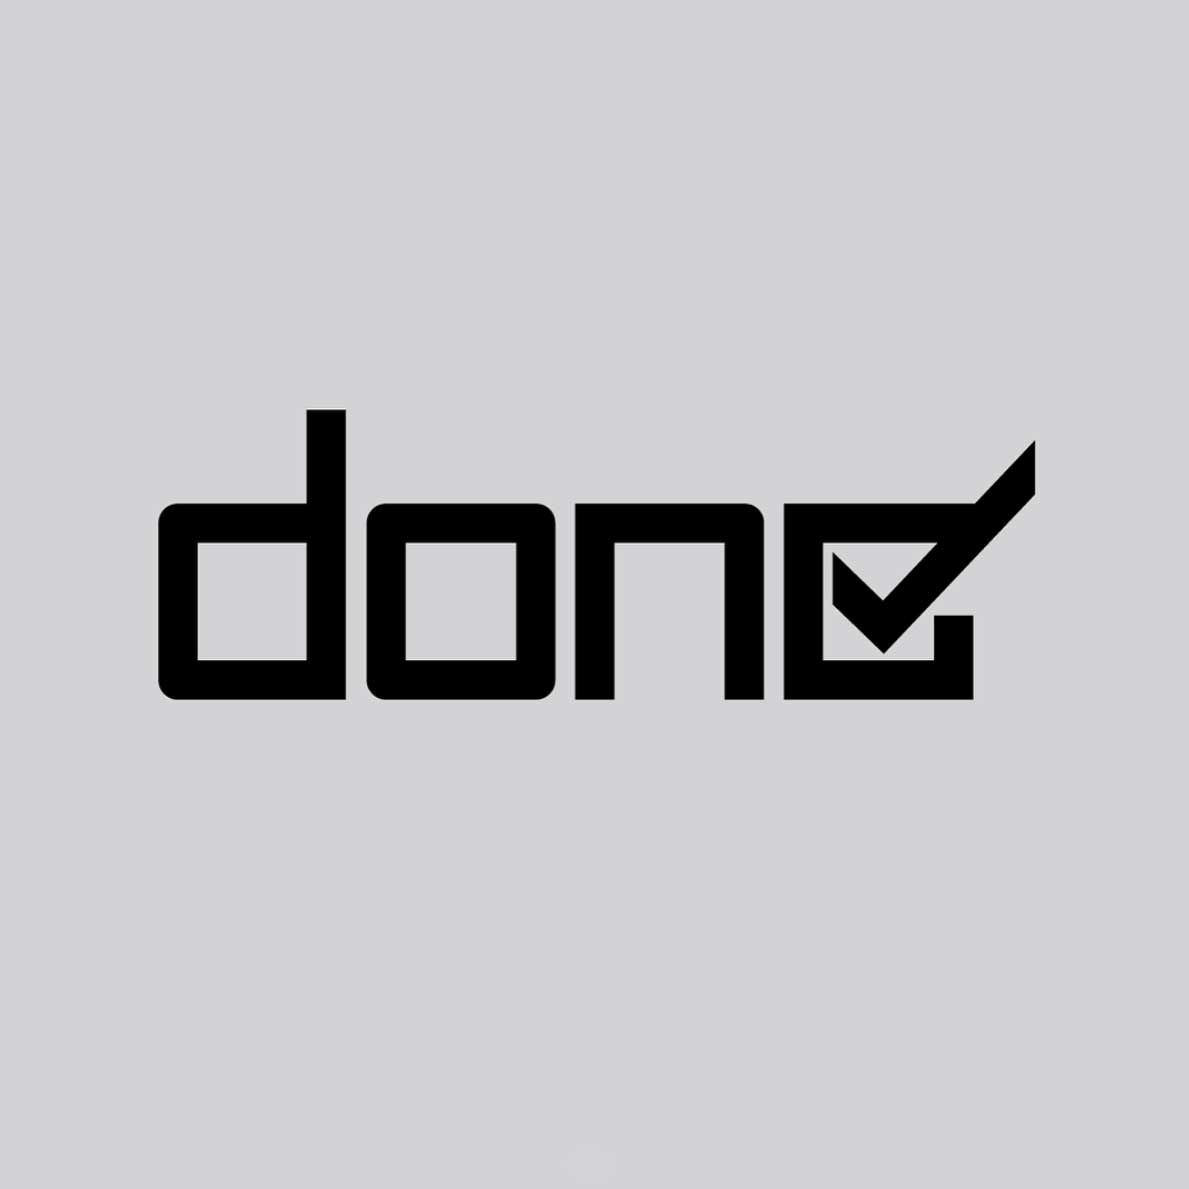 Daniel Carlmatz erstellt jeden Tag ein smartes Logo Daniel-Carlmatz-Logodaily_12